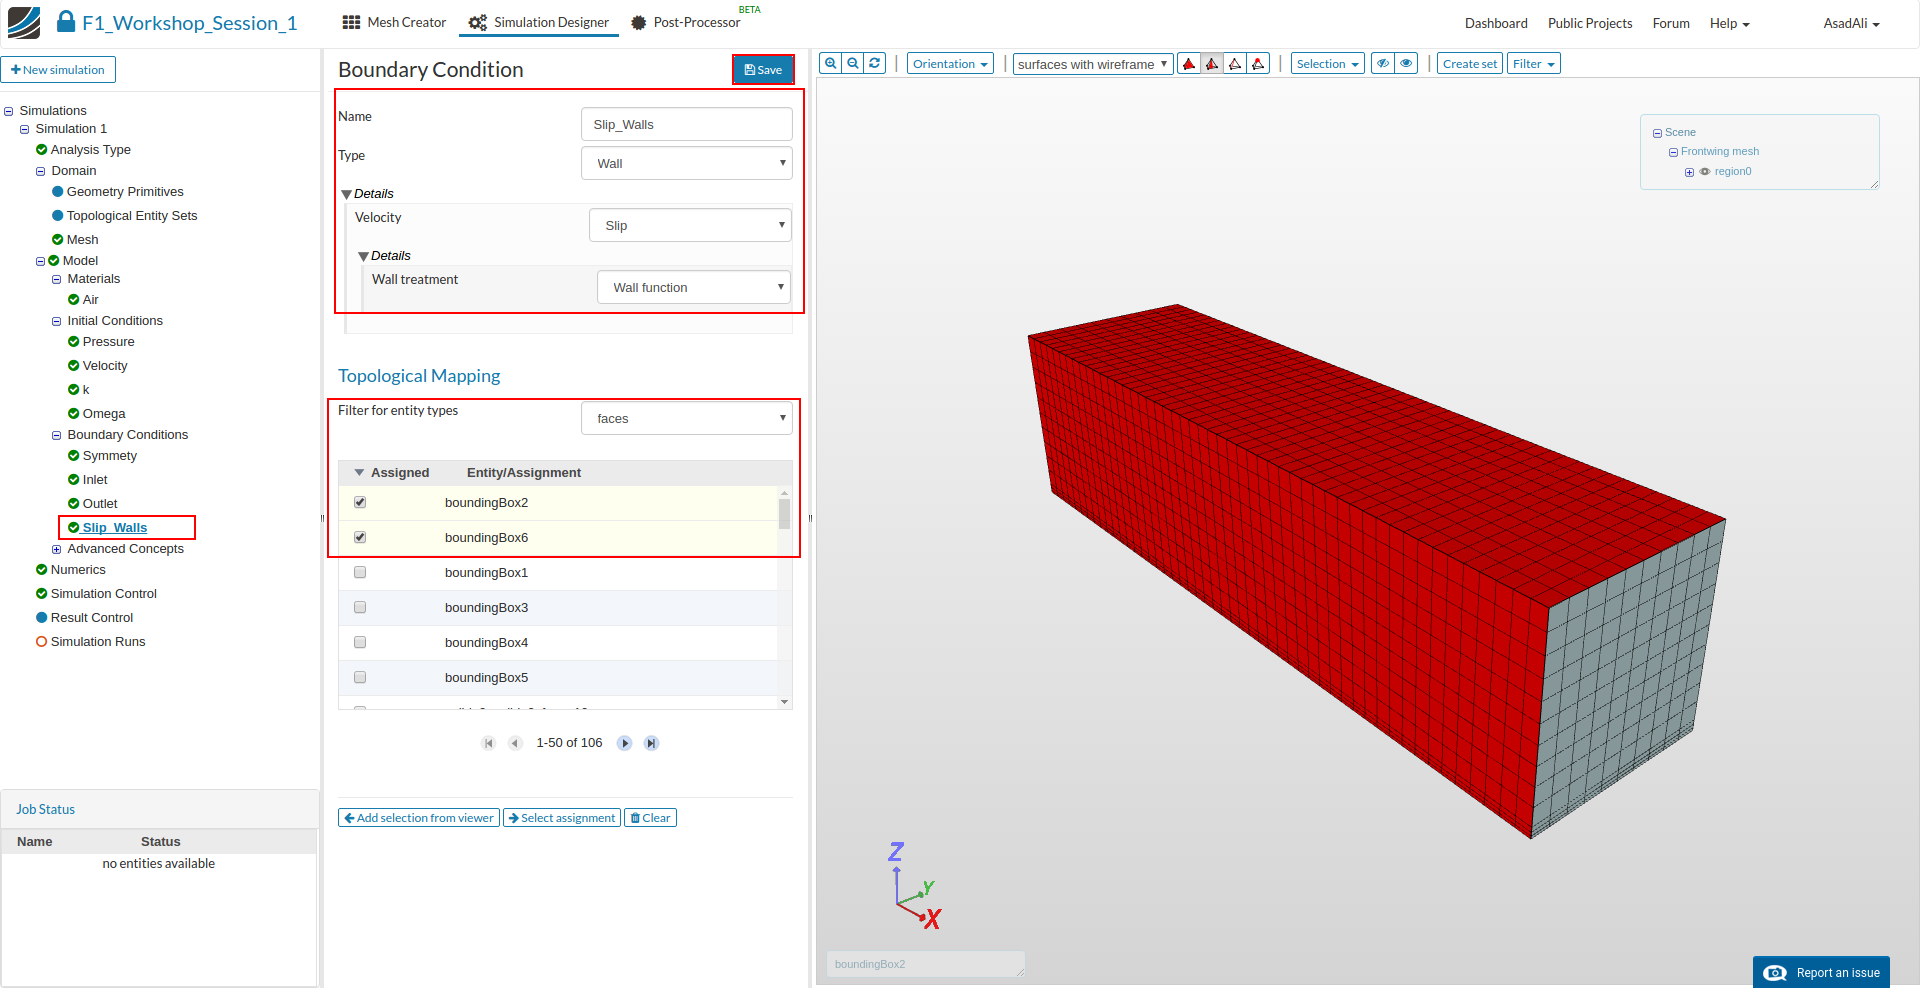 f1 aerodynamics simulation boundary condition setup